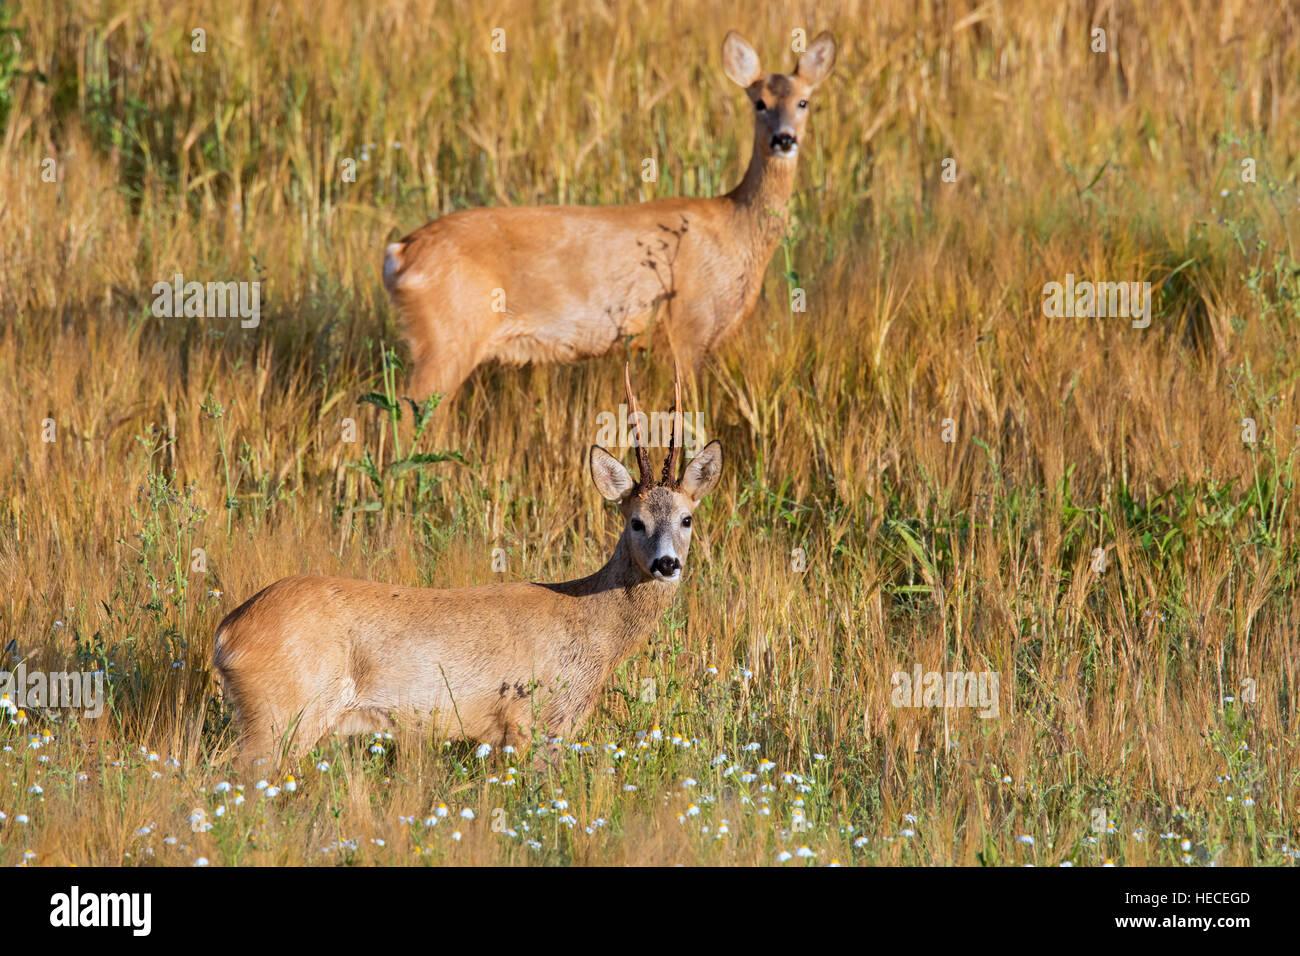 European roe deer (Capreolus capreolus) buck and doe in wheat field during the rut in summer - Stock Image